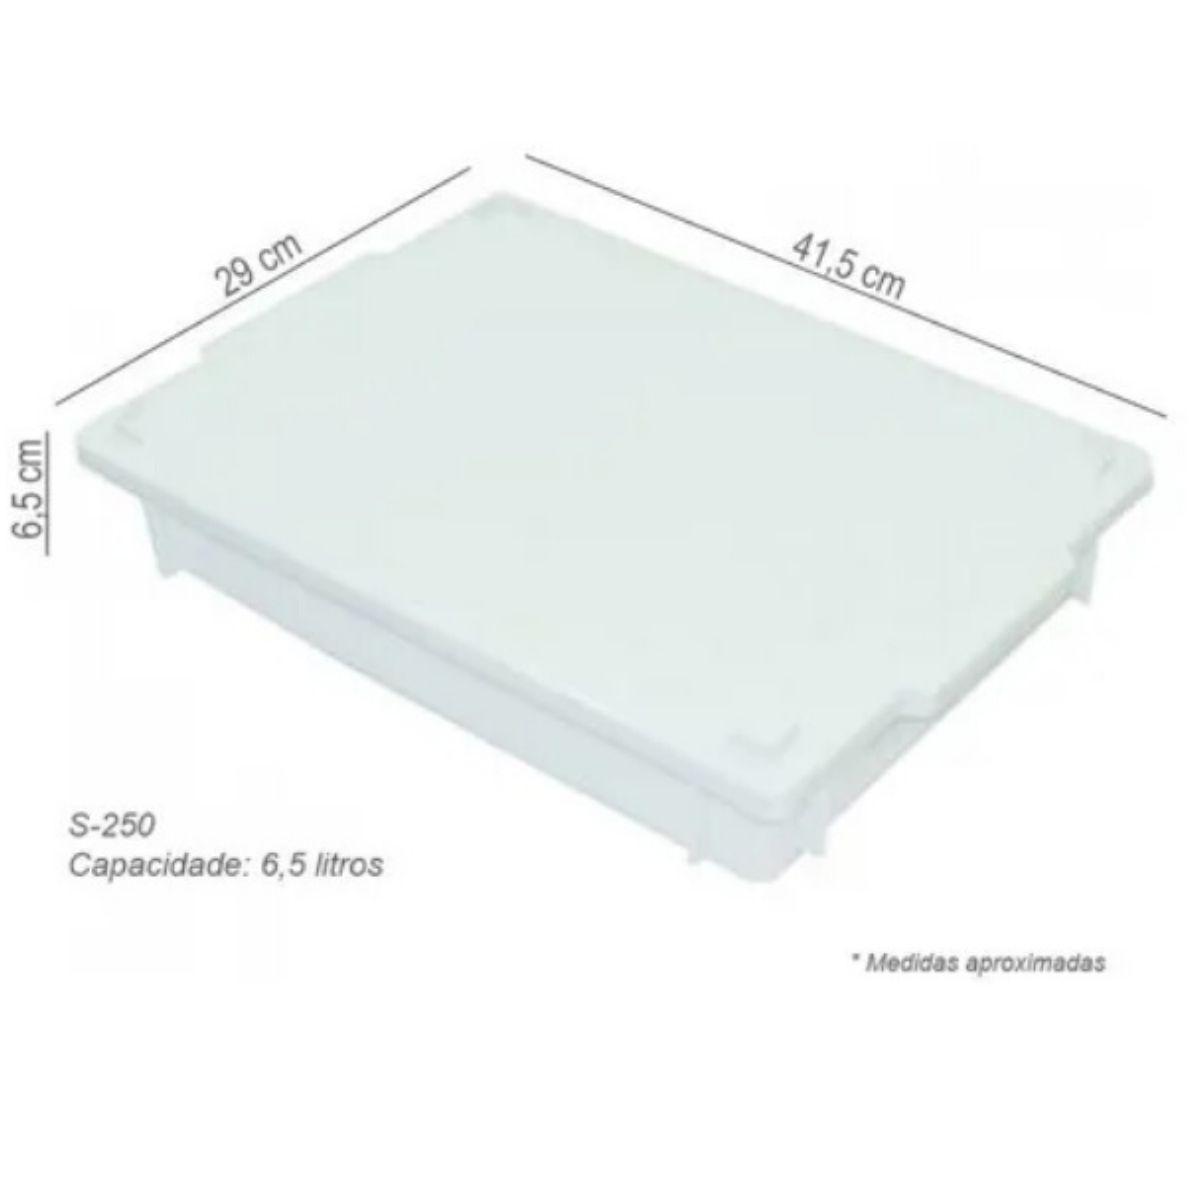 Caixa Plástica Branca Para Açogue C/ Tampa Supercron 6,5 Lts